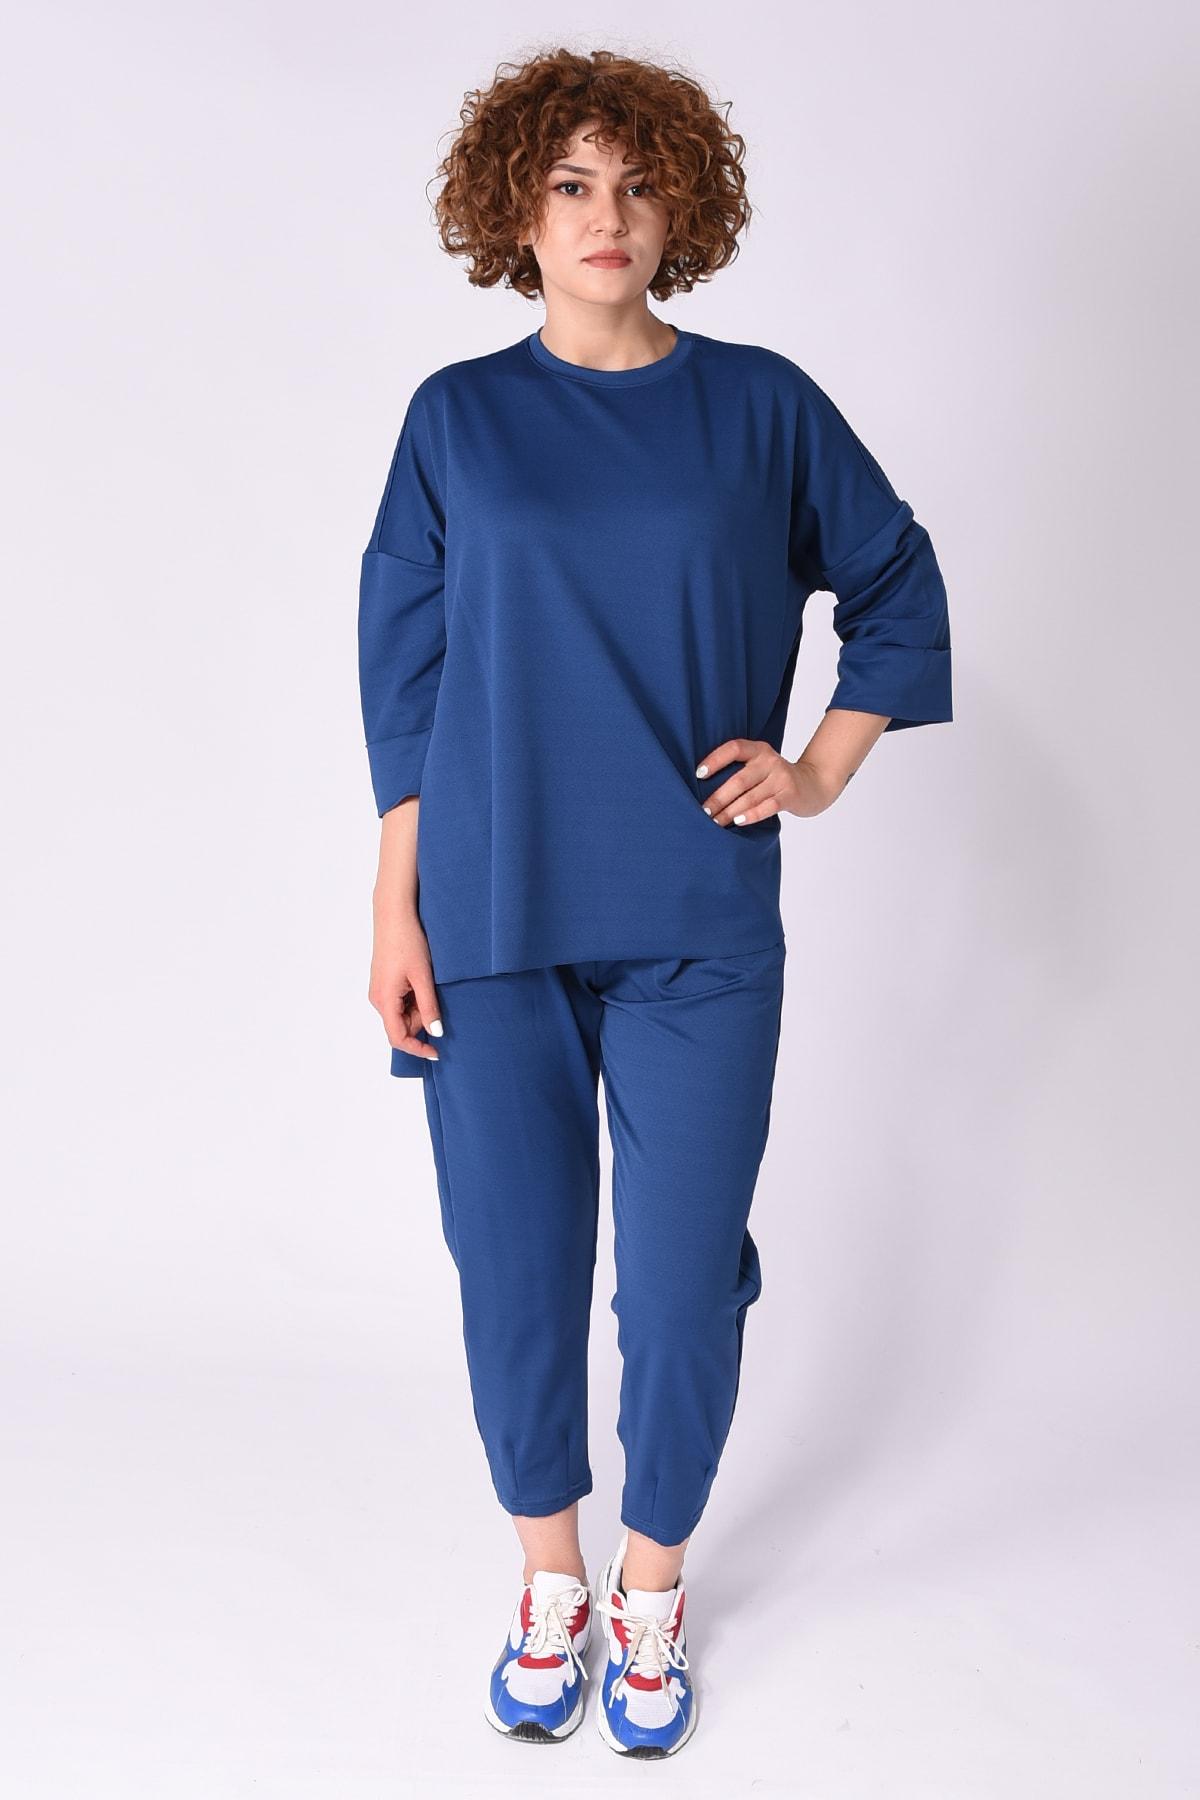 Samtoni Kadın Lacivert Sweatshirt Alt Üst Takım 1